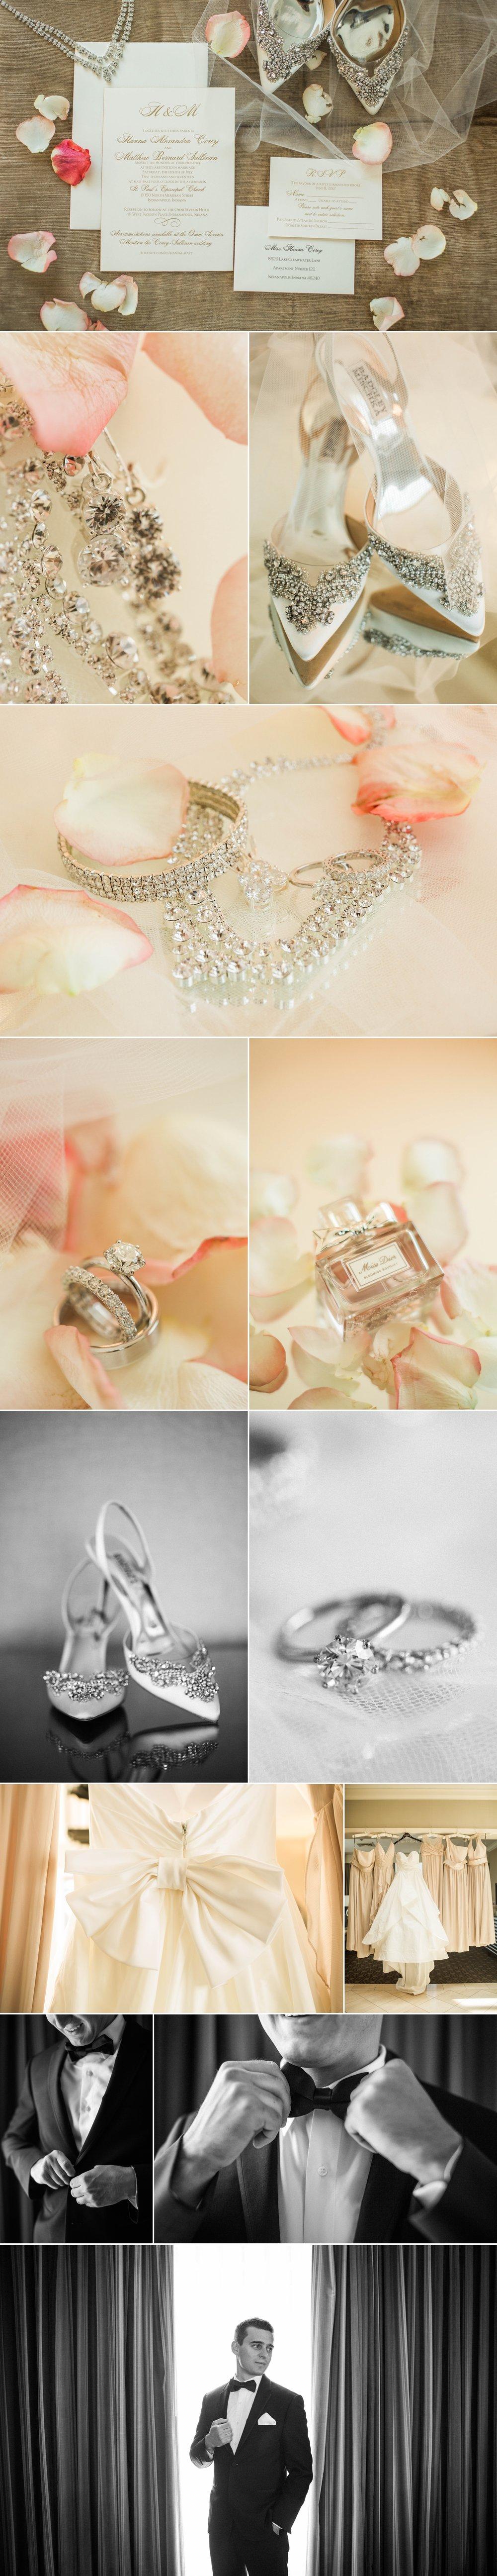 wedding-wedding day-bride-getting ready-details-bridal details-indianapolis-the omni-groom-wedding ring